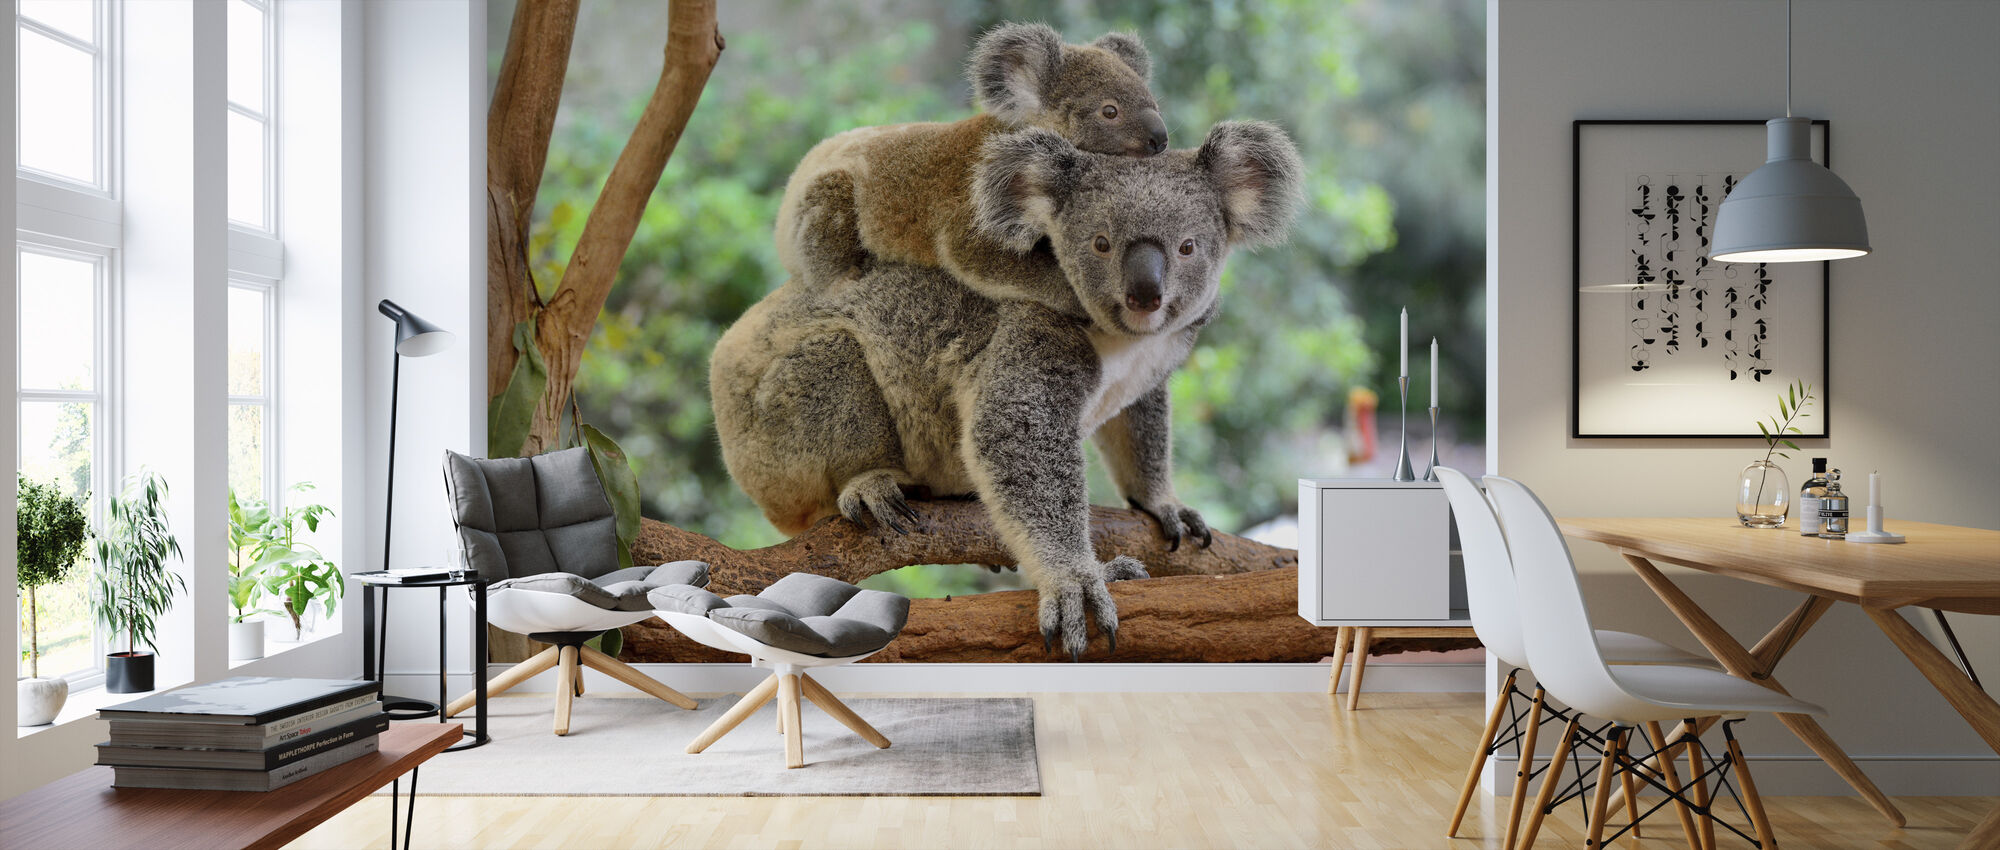 Koala with Baby - Wallpaper - Living Room